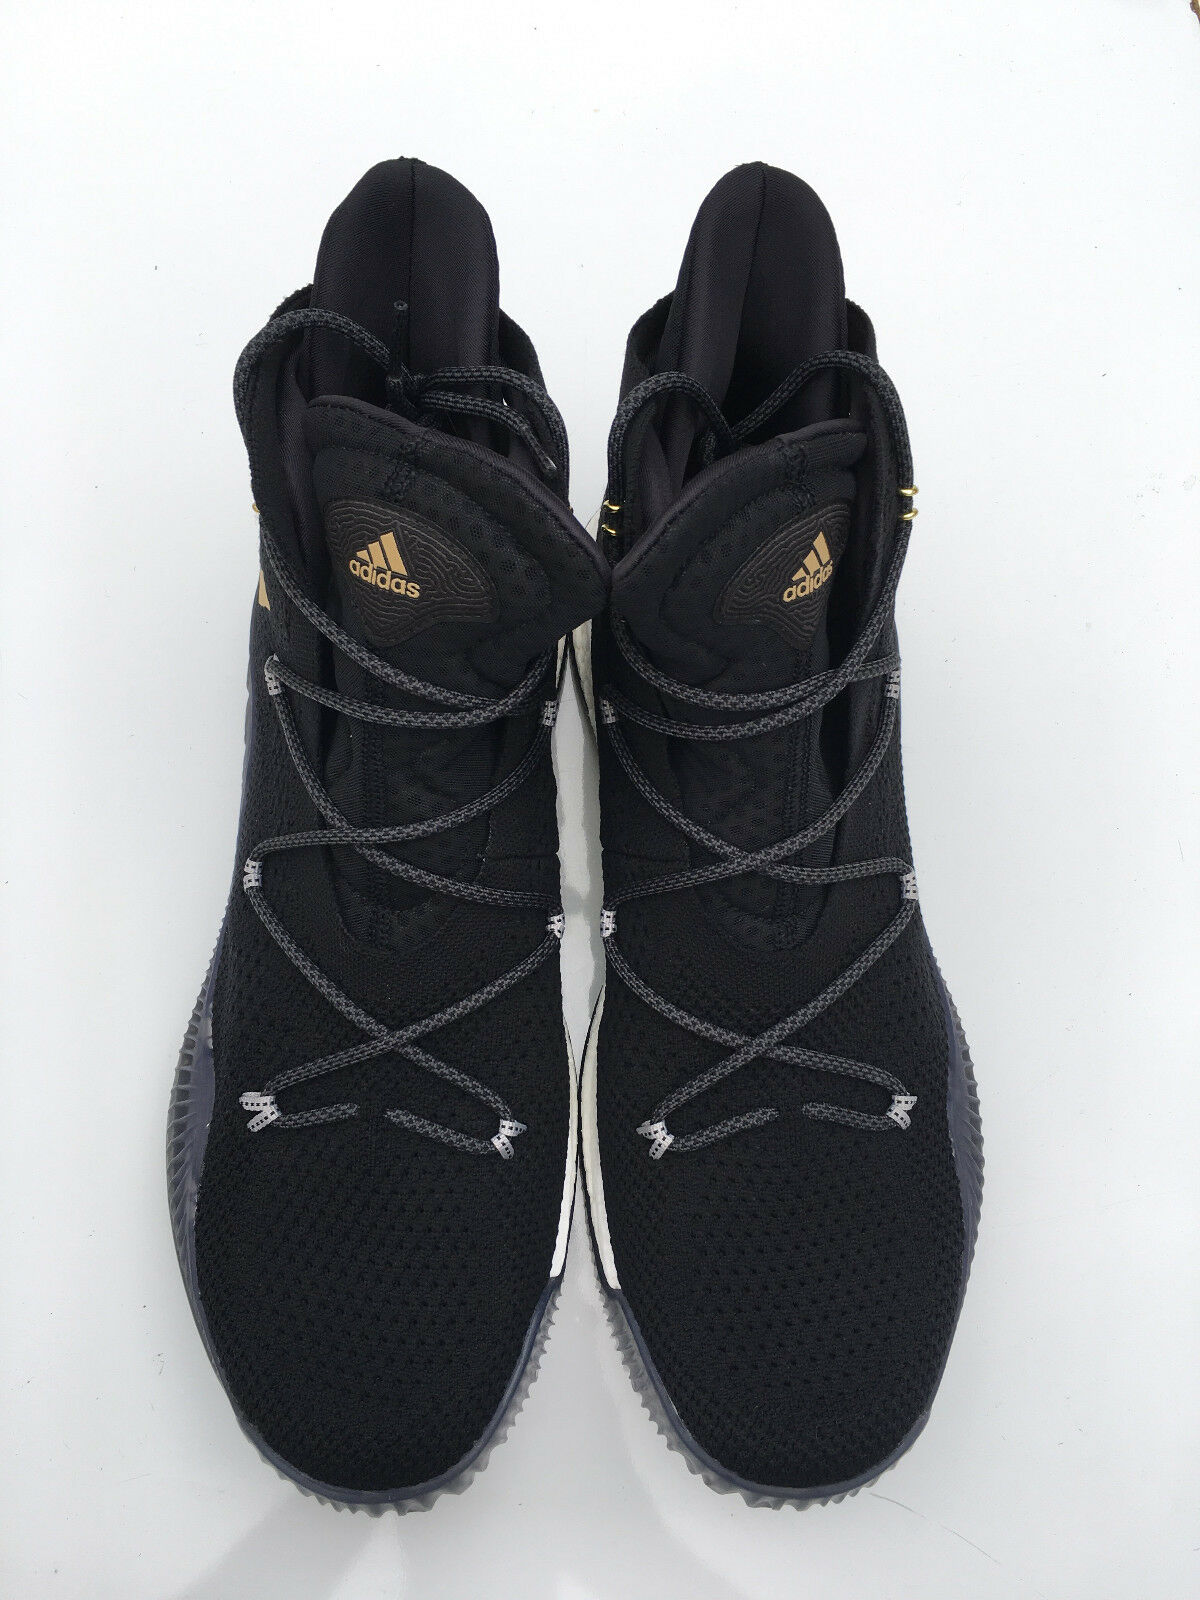 Adidas SM Crazy Explosive Primeknit Gauntlet shoes Men's Basketball